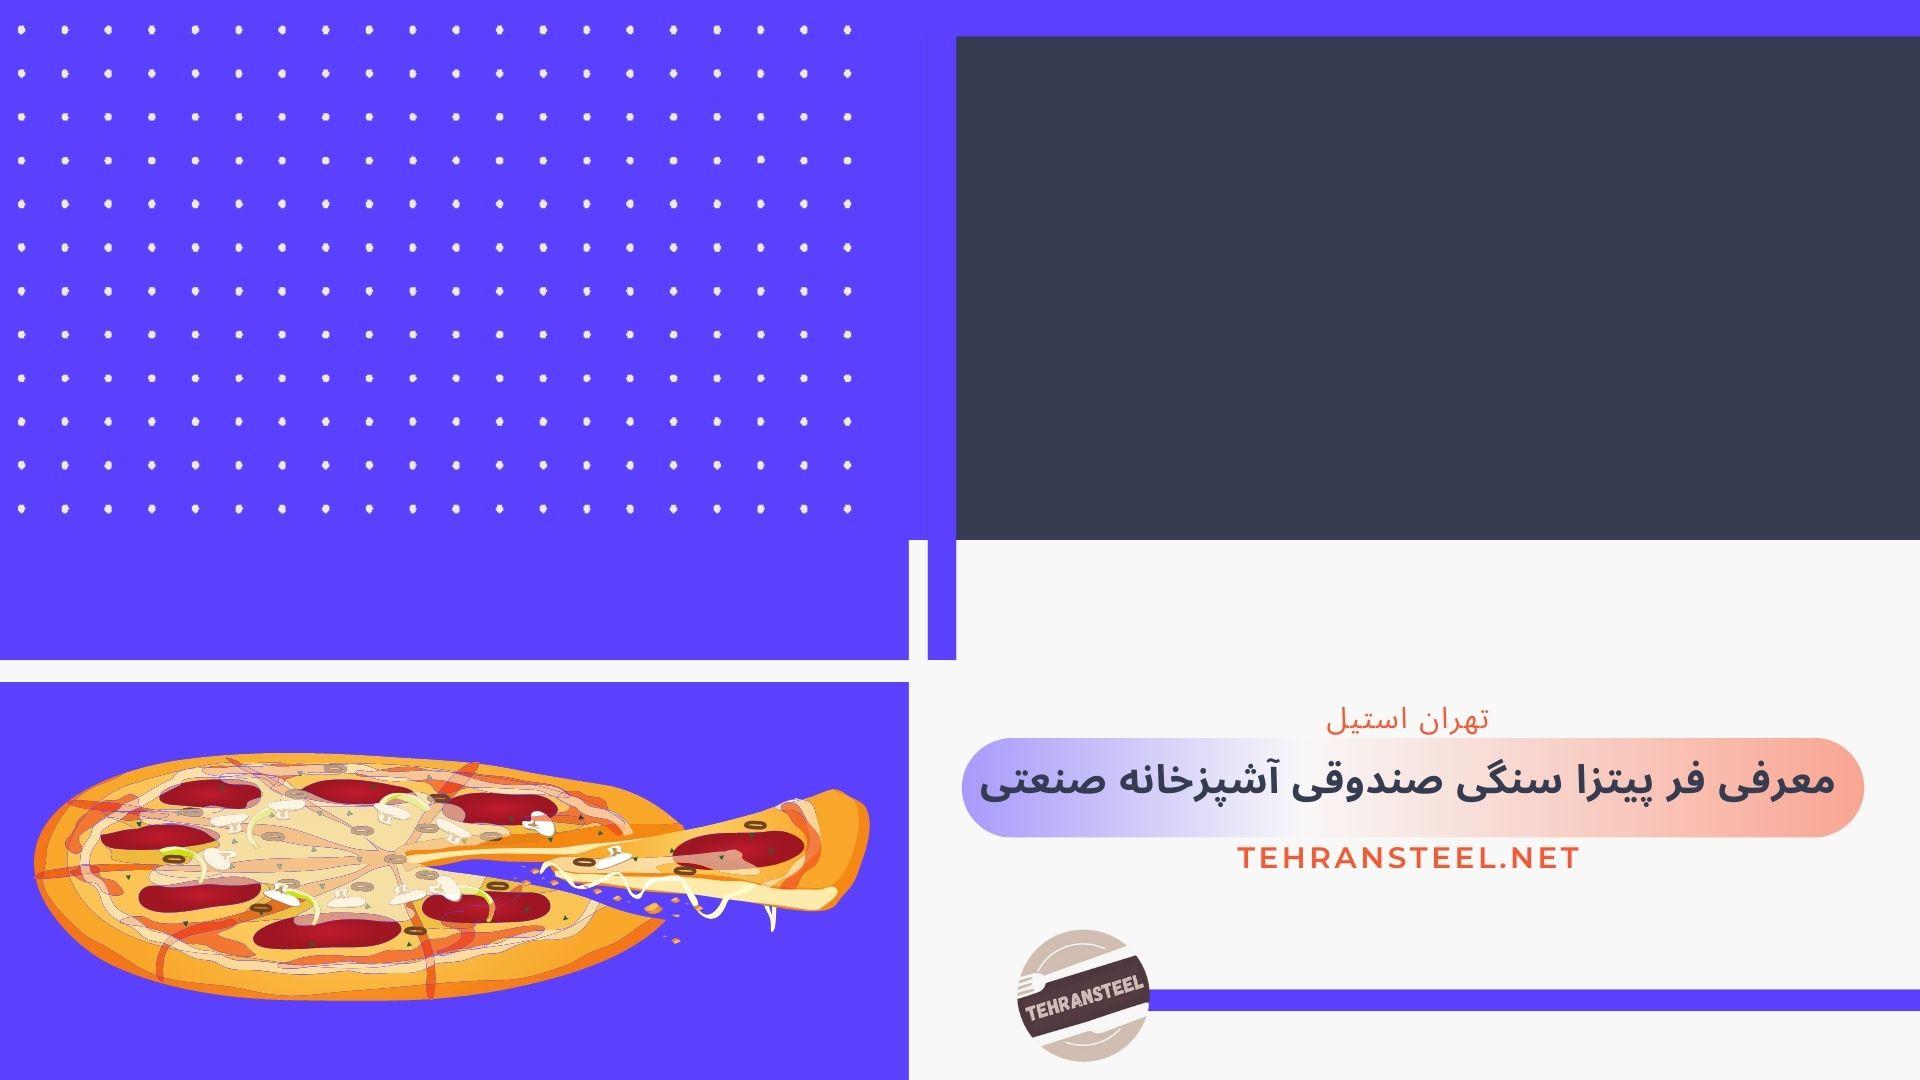 معرفی فر پیتزا سنگی صندوقی آشپزخانه صنعتی